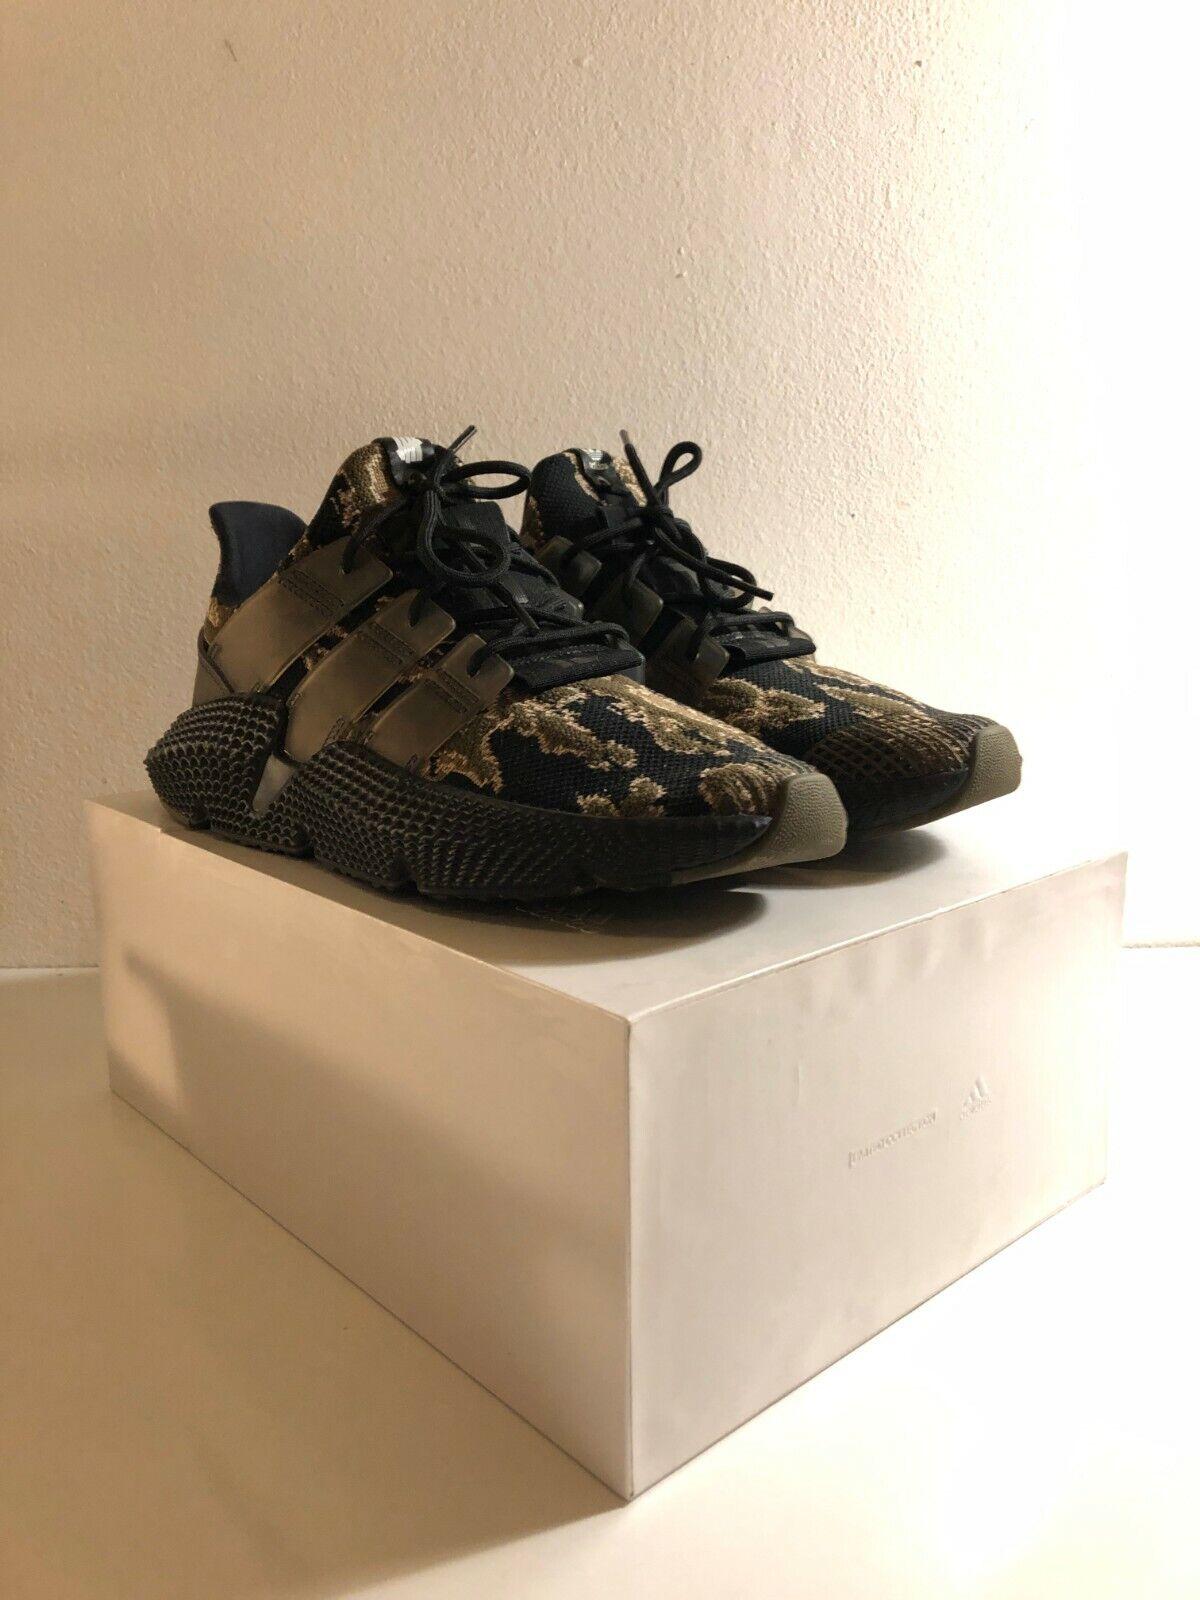 Adidas Consortium x UNDFTD (Undefeated) Prophere Tiger Camo US 11 UK 10 1 2 EU 4